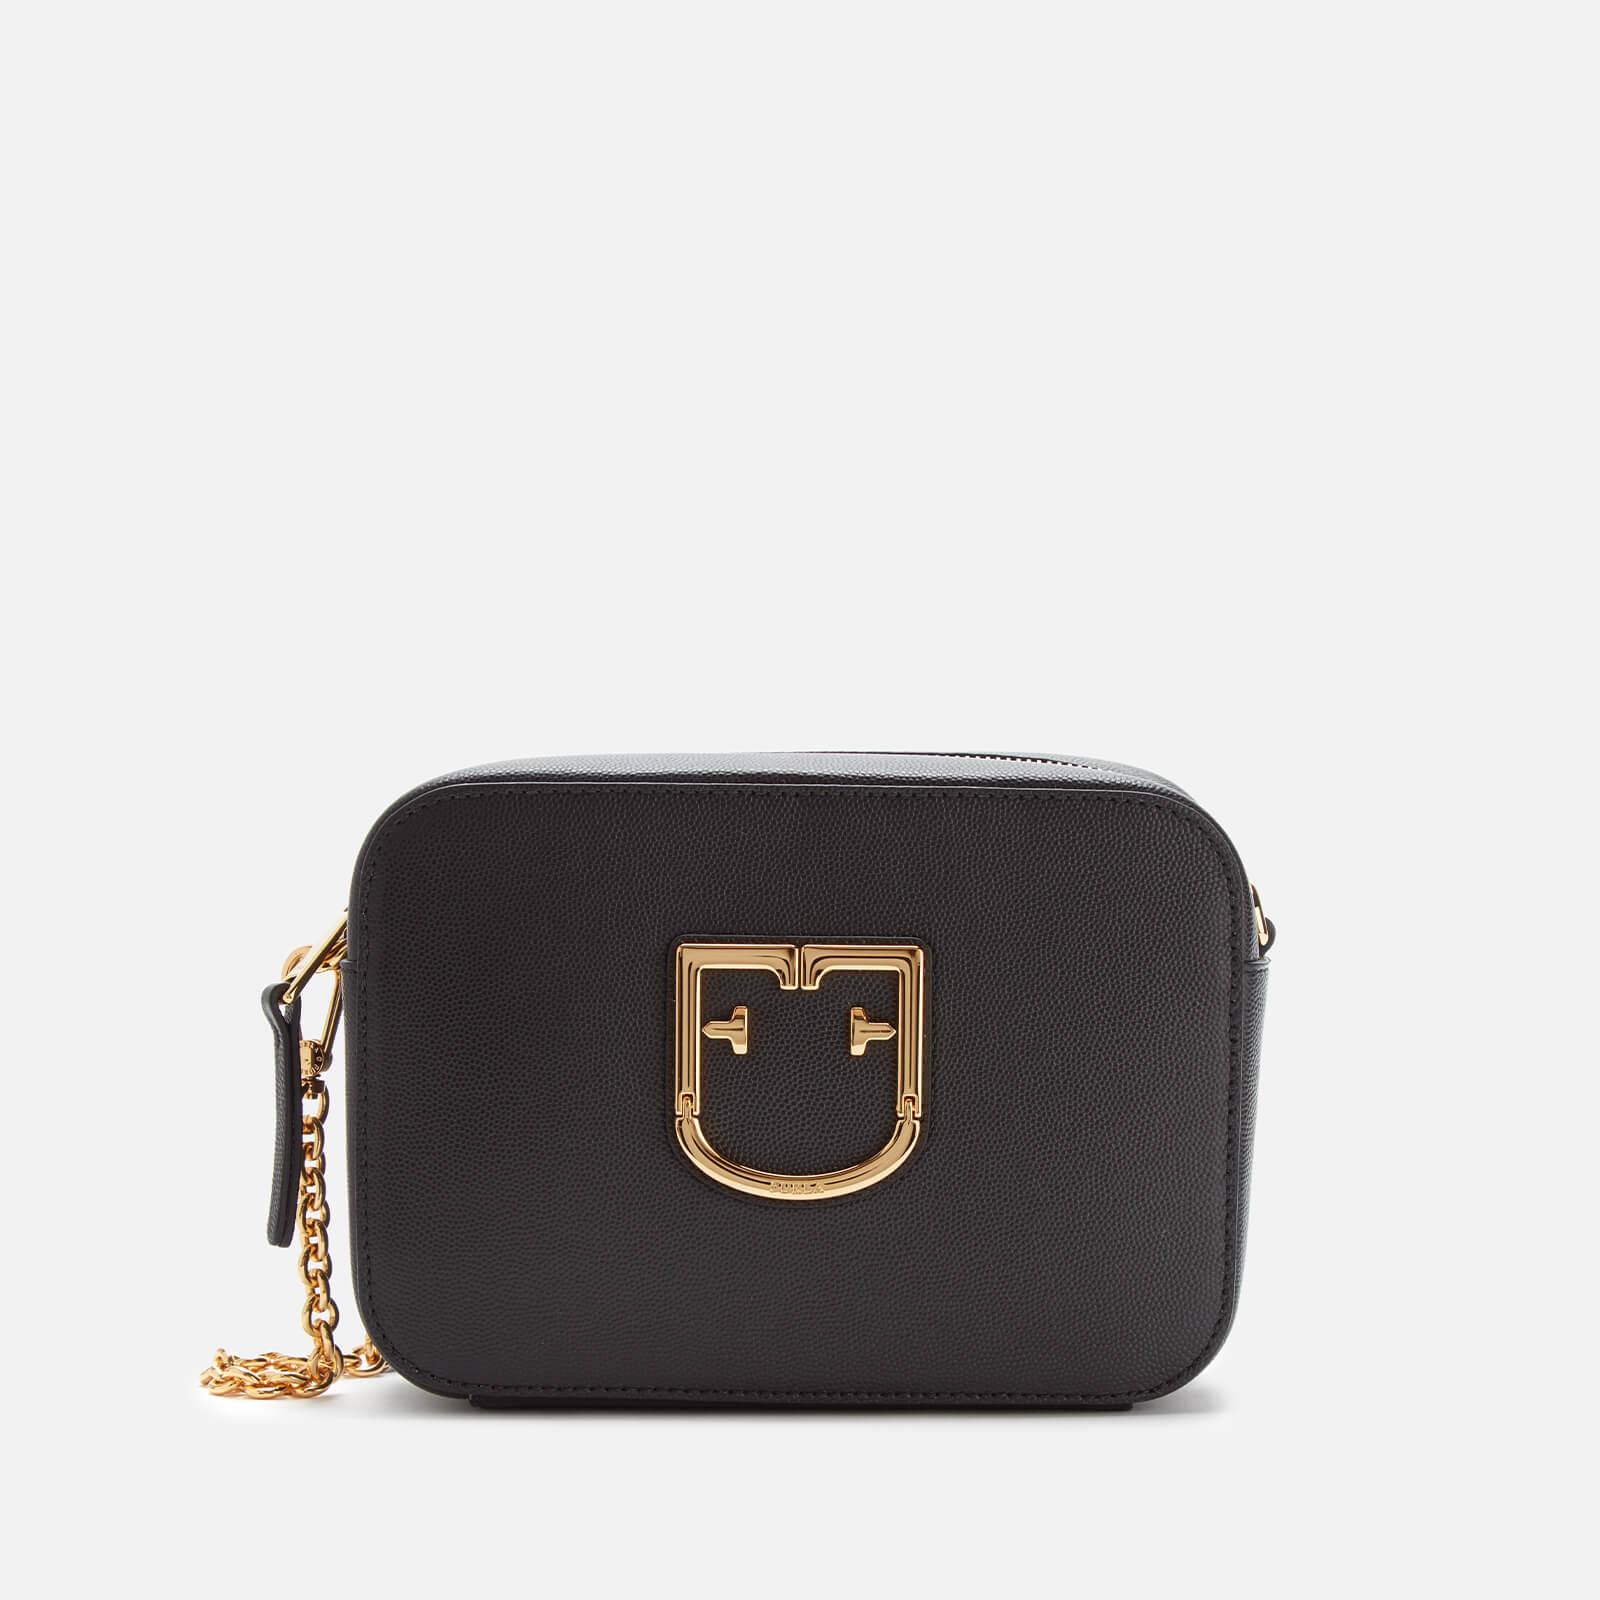 Furla Women's Brava Mini Cross Body Bag - Onyx